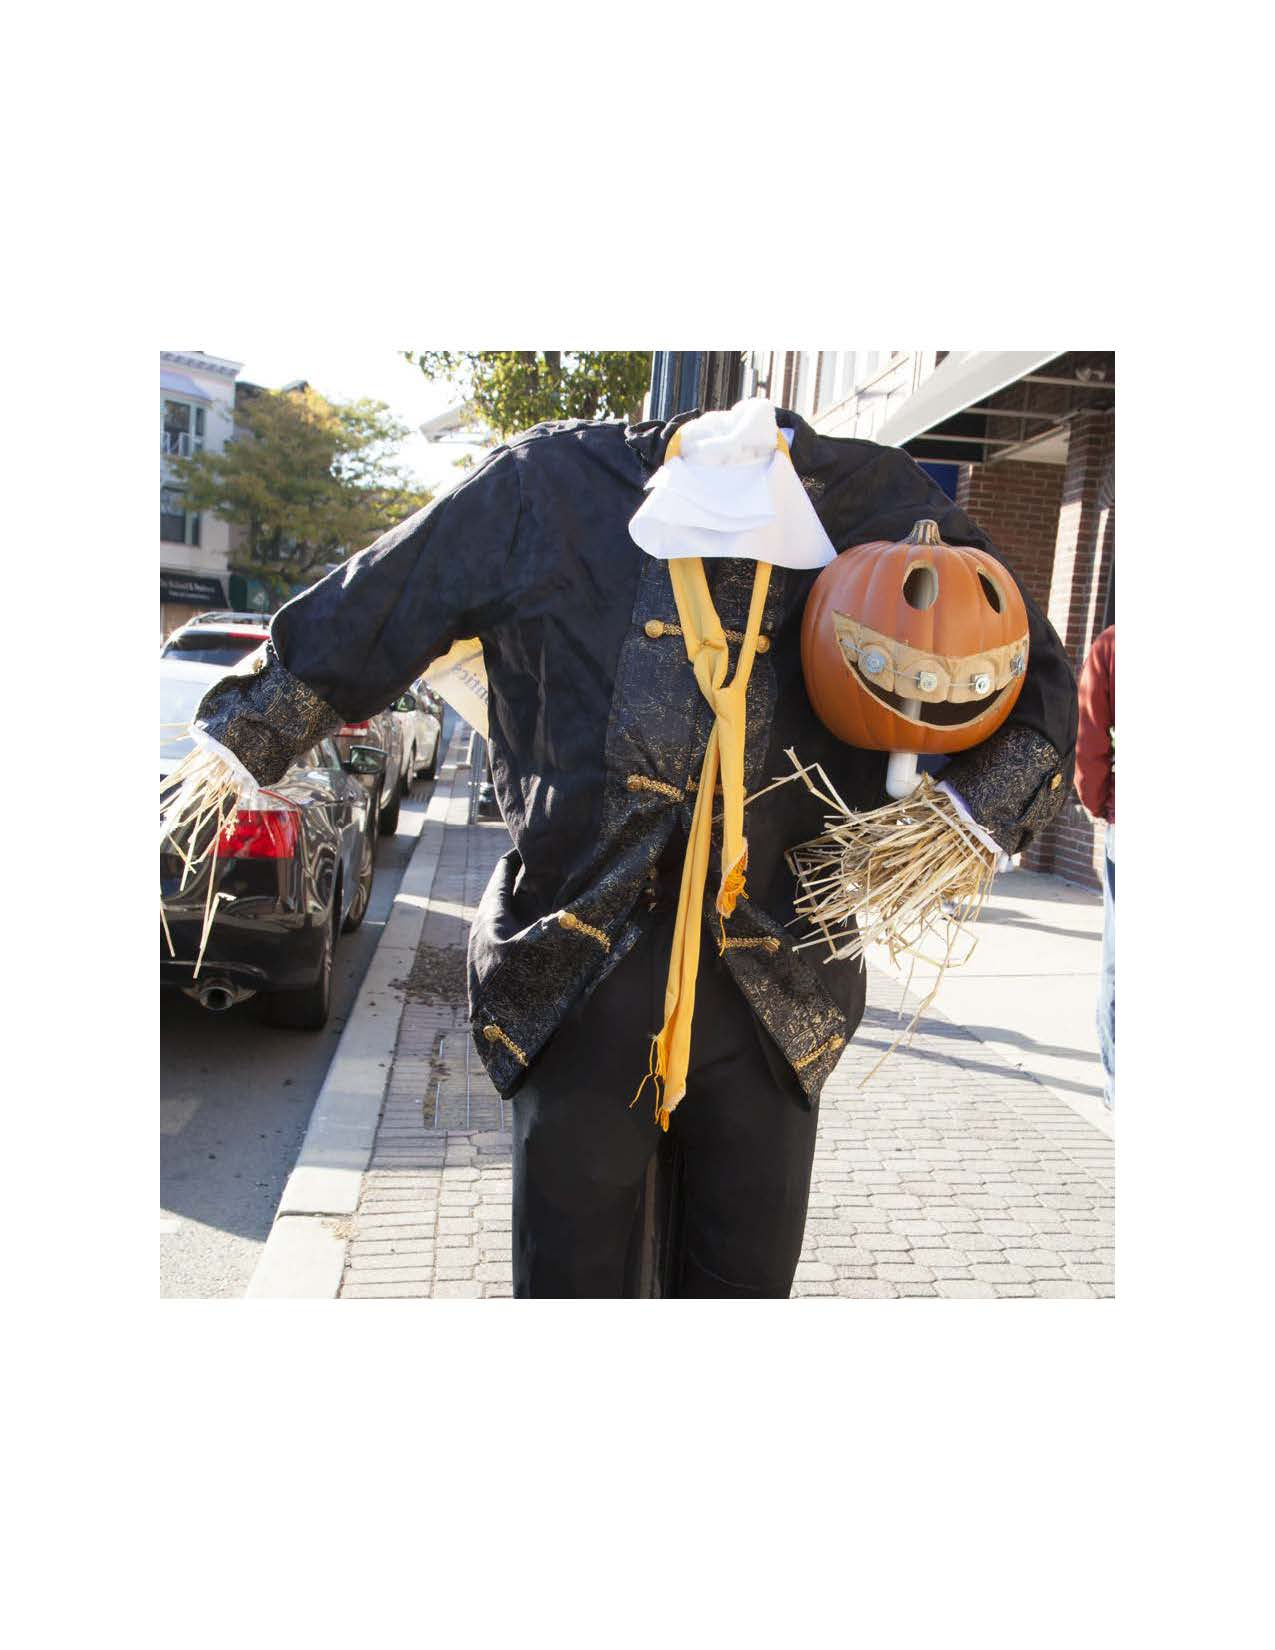 Downtown Benicia Annual Scarecrow Contest